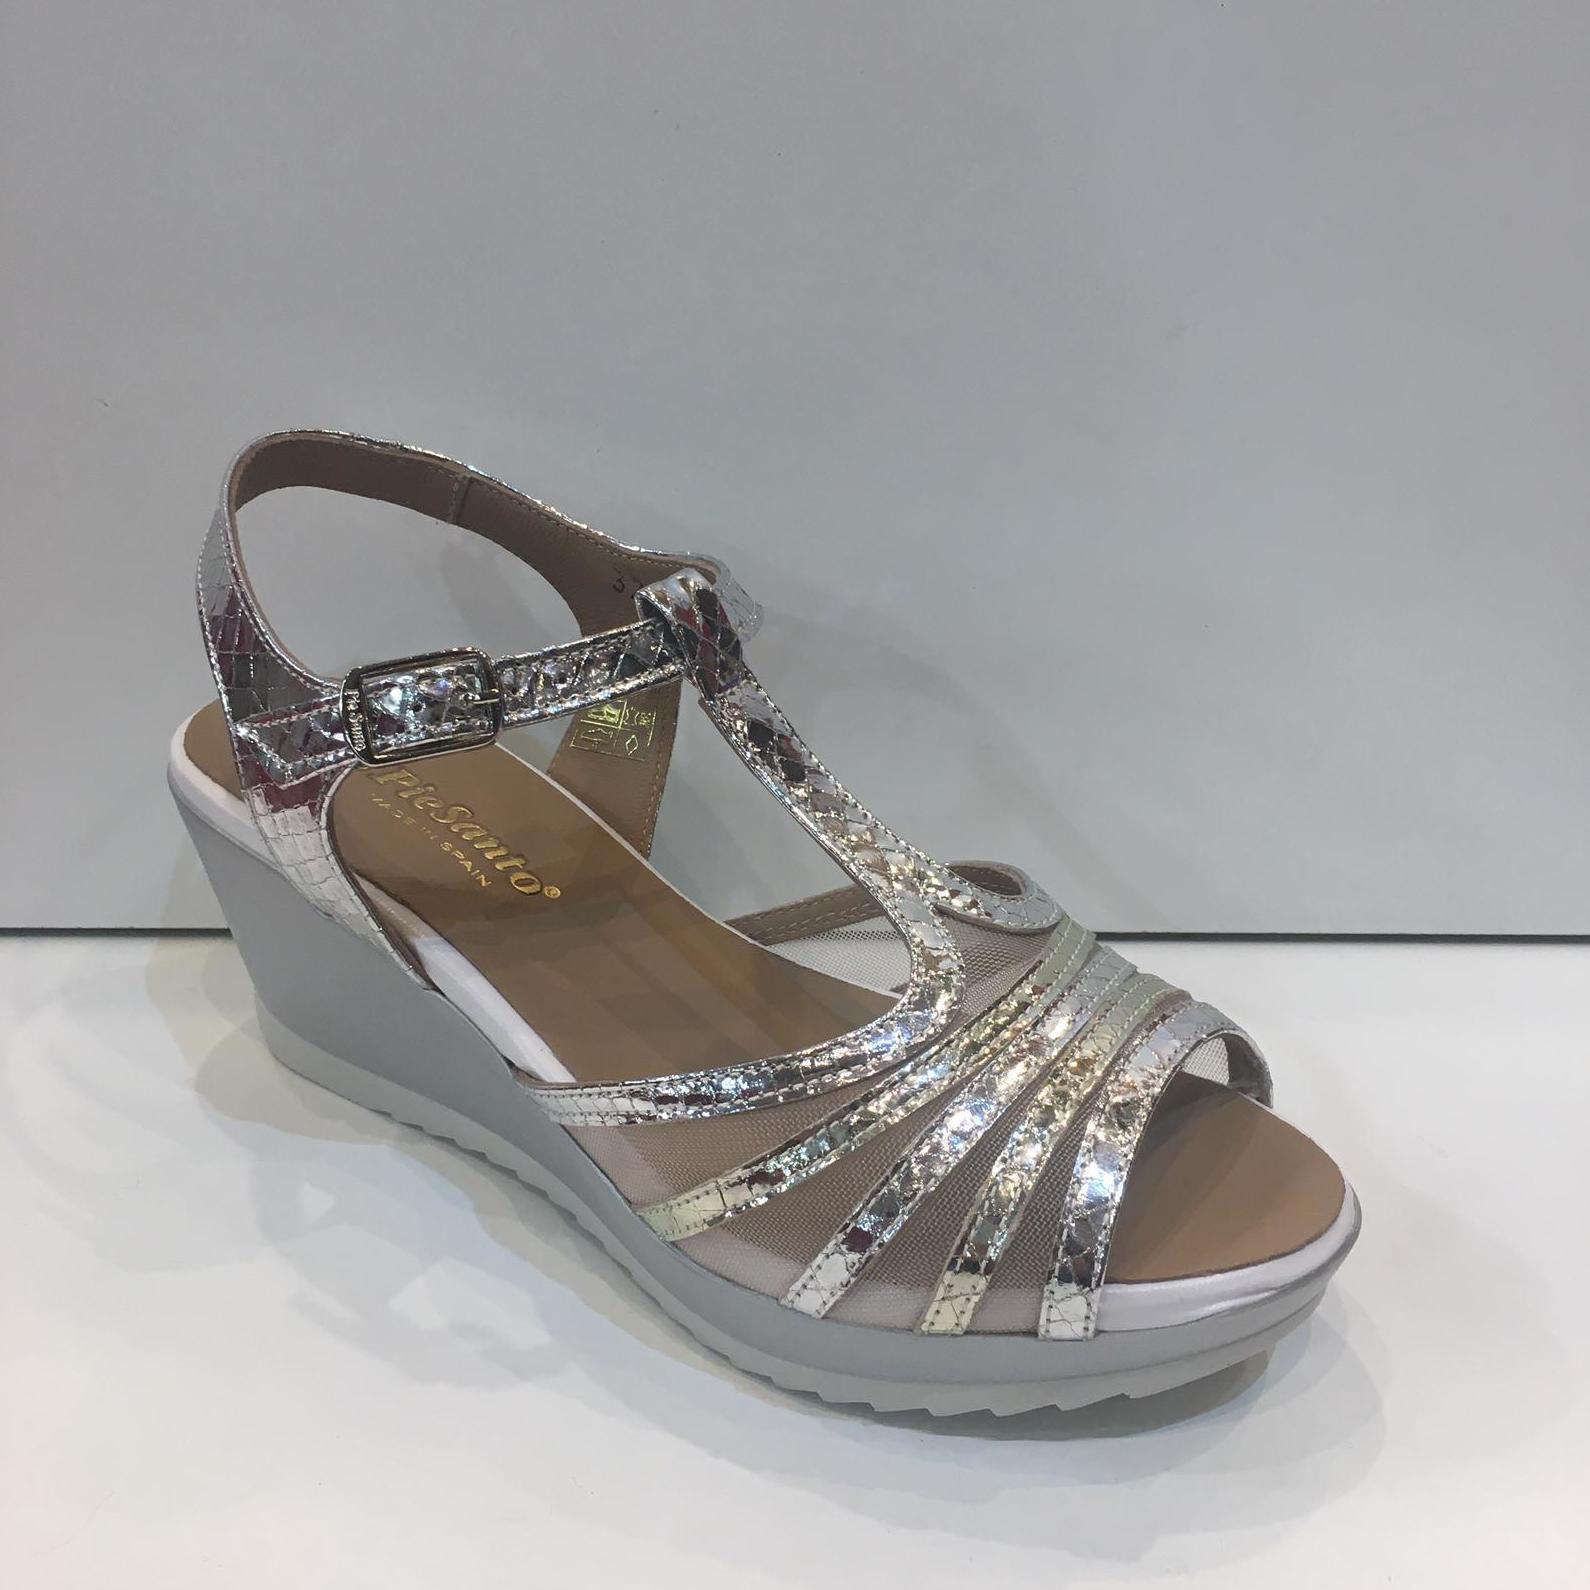 Sandàlia de dona, de la marca Pie Santo, ample especial, plantilla de viscoelàstica i plataforma de 7 centímetres 99.95€